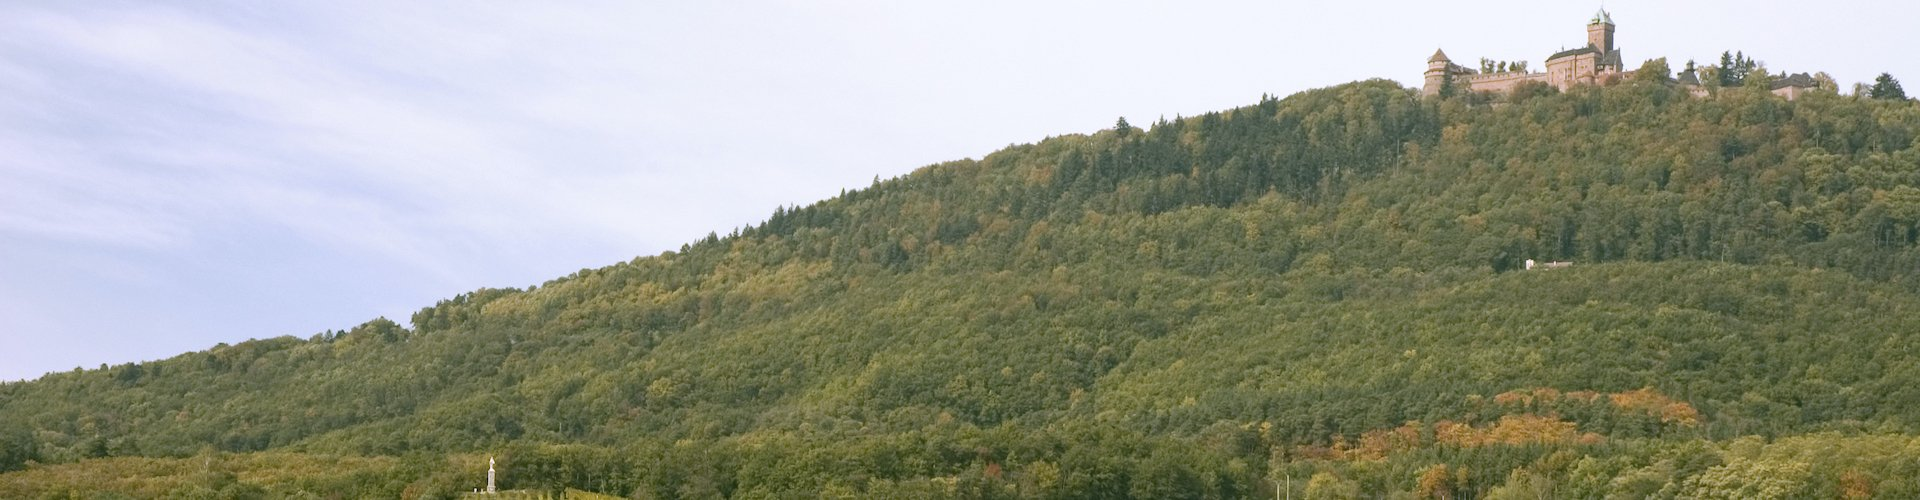 Ausflugsziel Burg Haut-Koenigsbourg